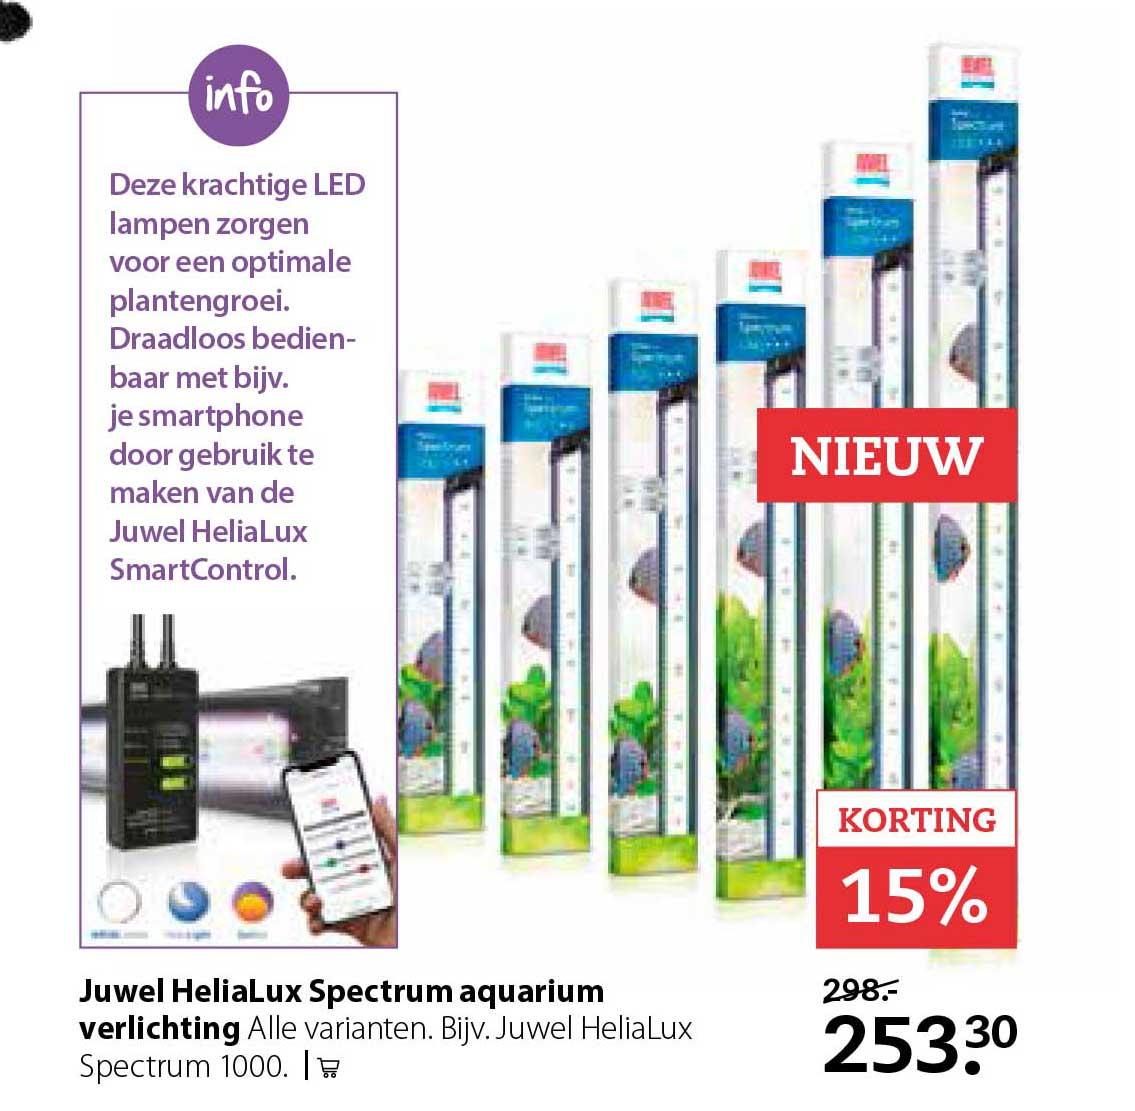 Pets Place Juwel Helialux Spectrum Aquarium Verlichting: 15% Korting